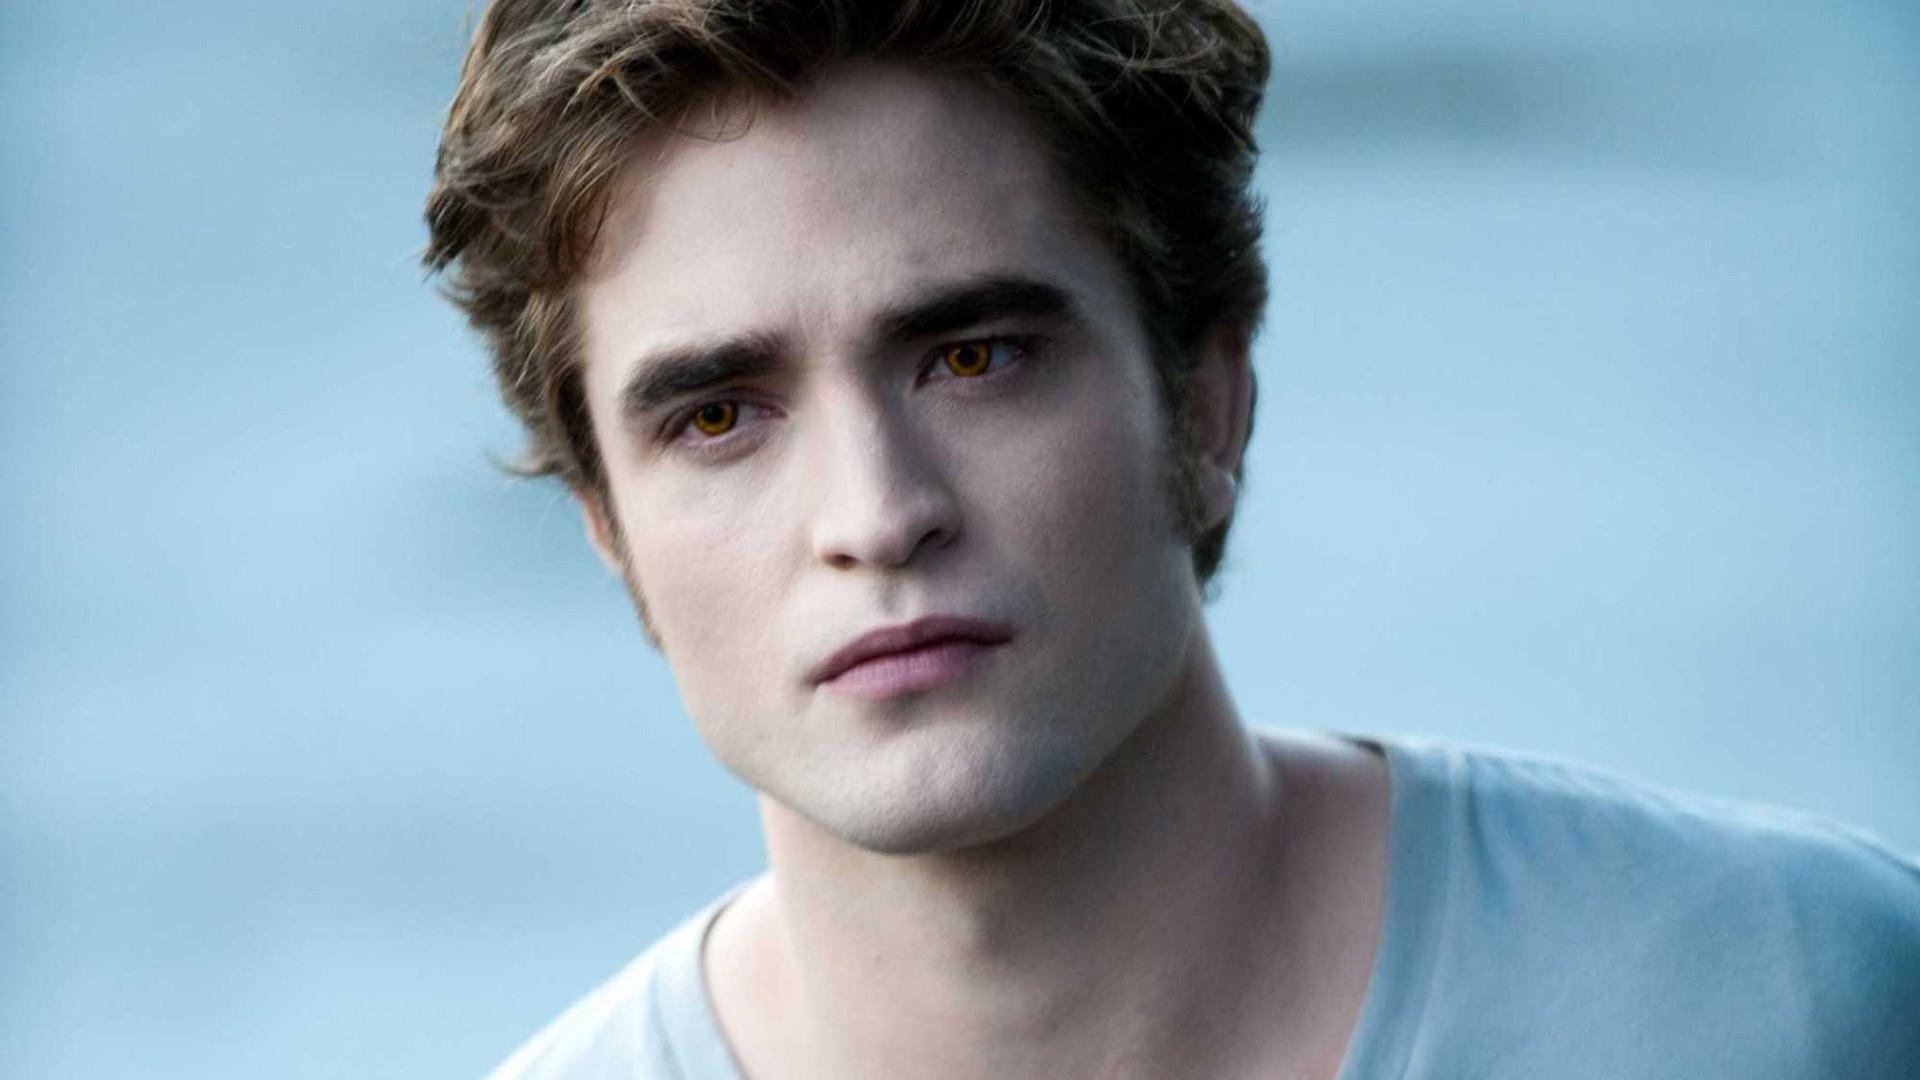 Twilight Edward Cullen Wallpaper 70 Images